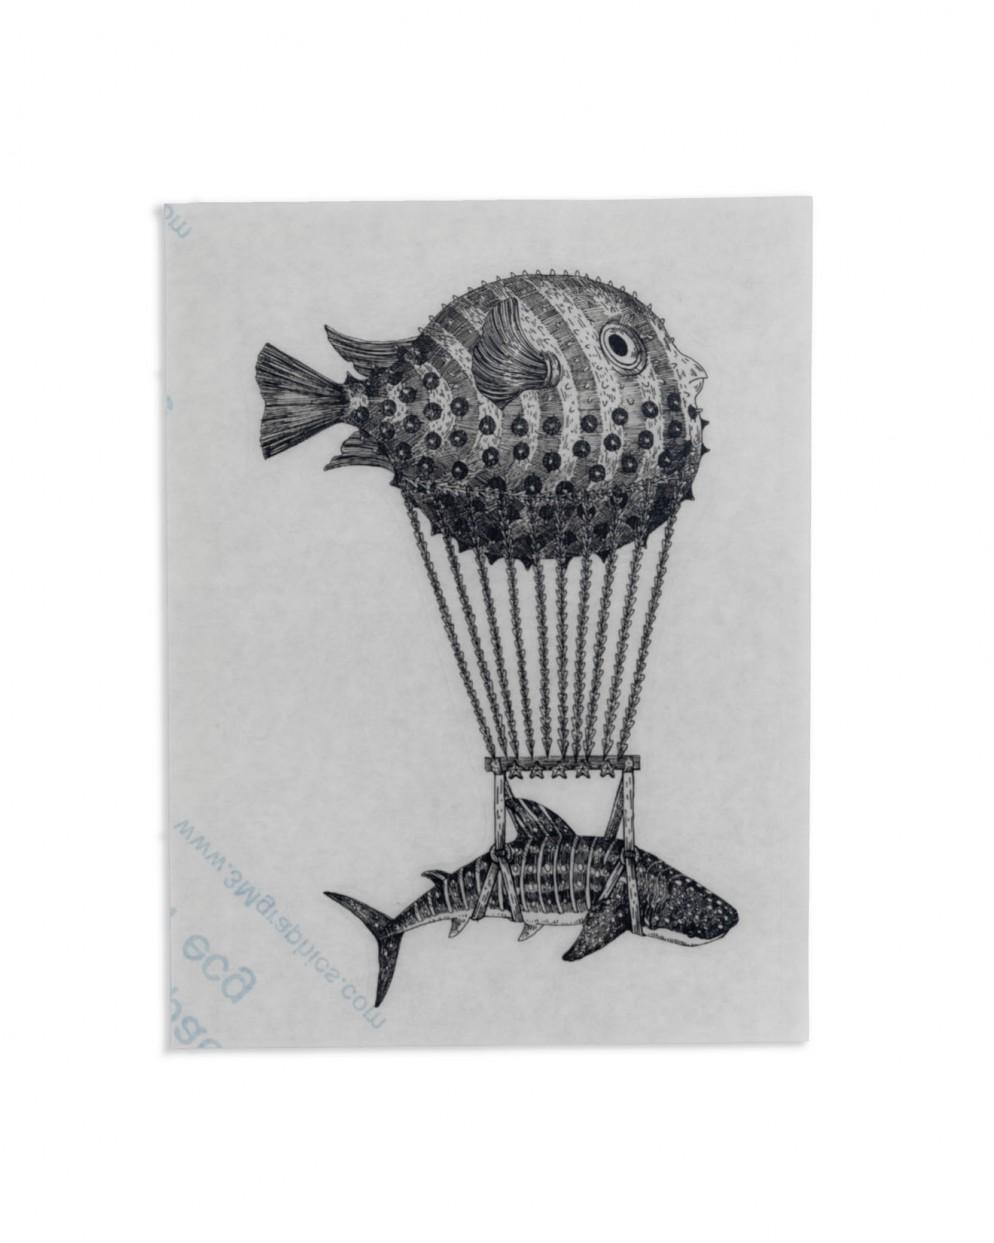 collezione-stickers-notebook-piatti-aquatic-creatures-20